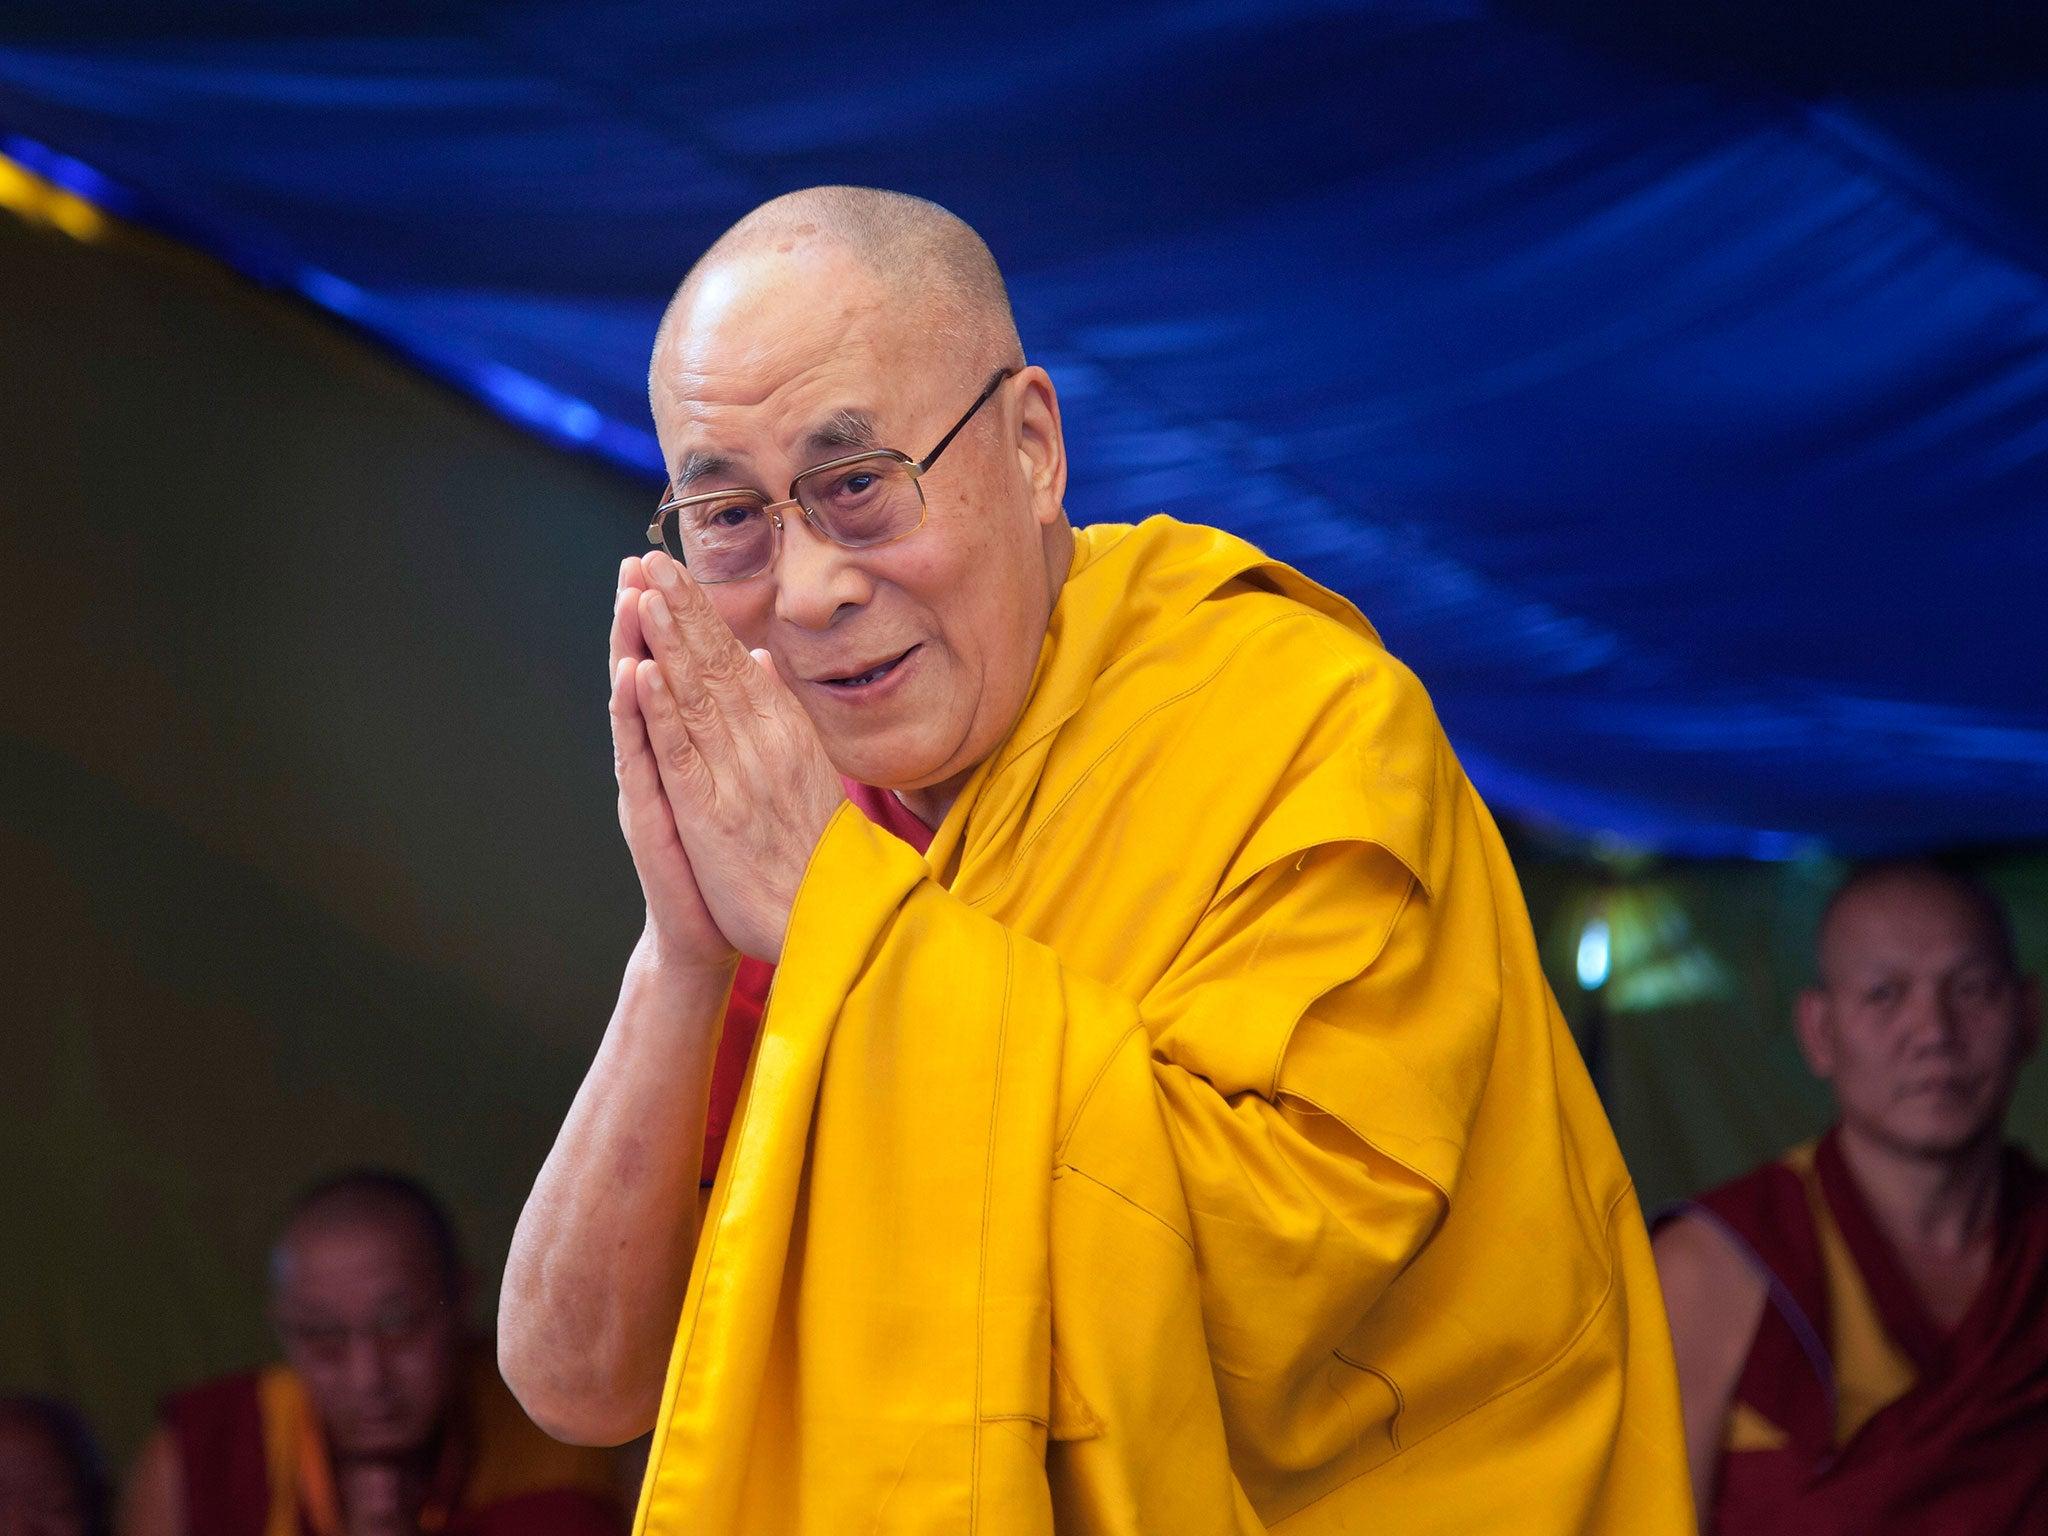 Glastonbury 2015: Dalai Lama uses first festival visit to brand Isis violence 'unthinkable' | The Independentindependent_brand_ident_LOGOUntitled